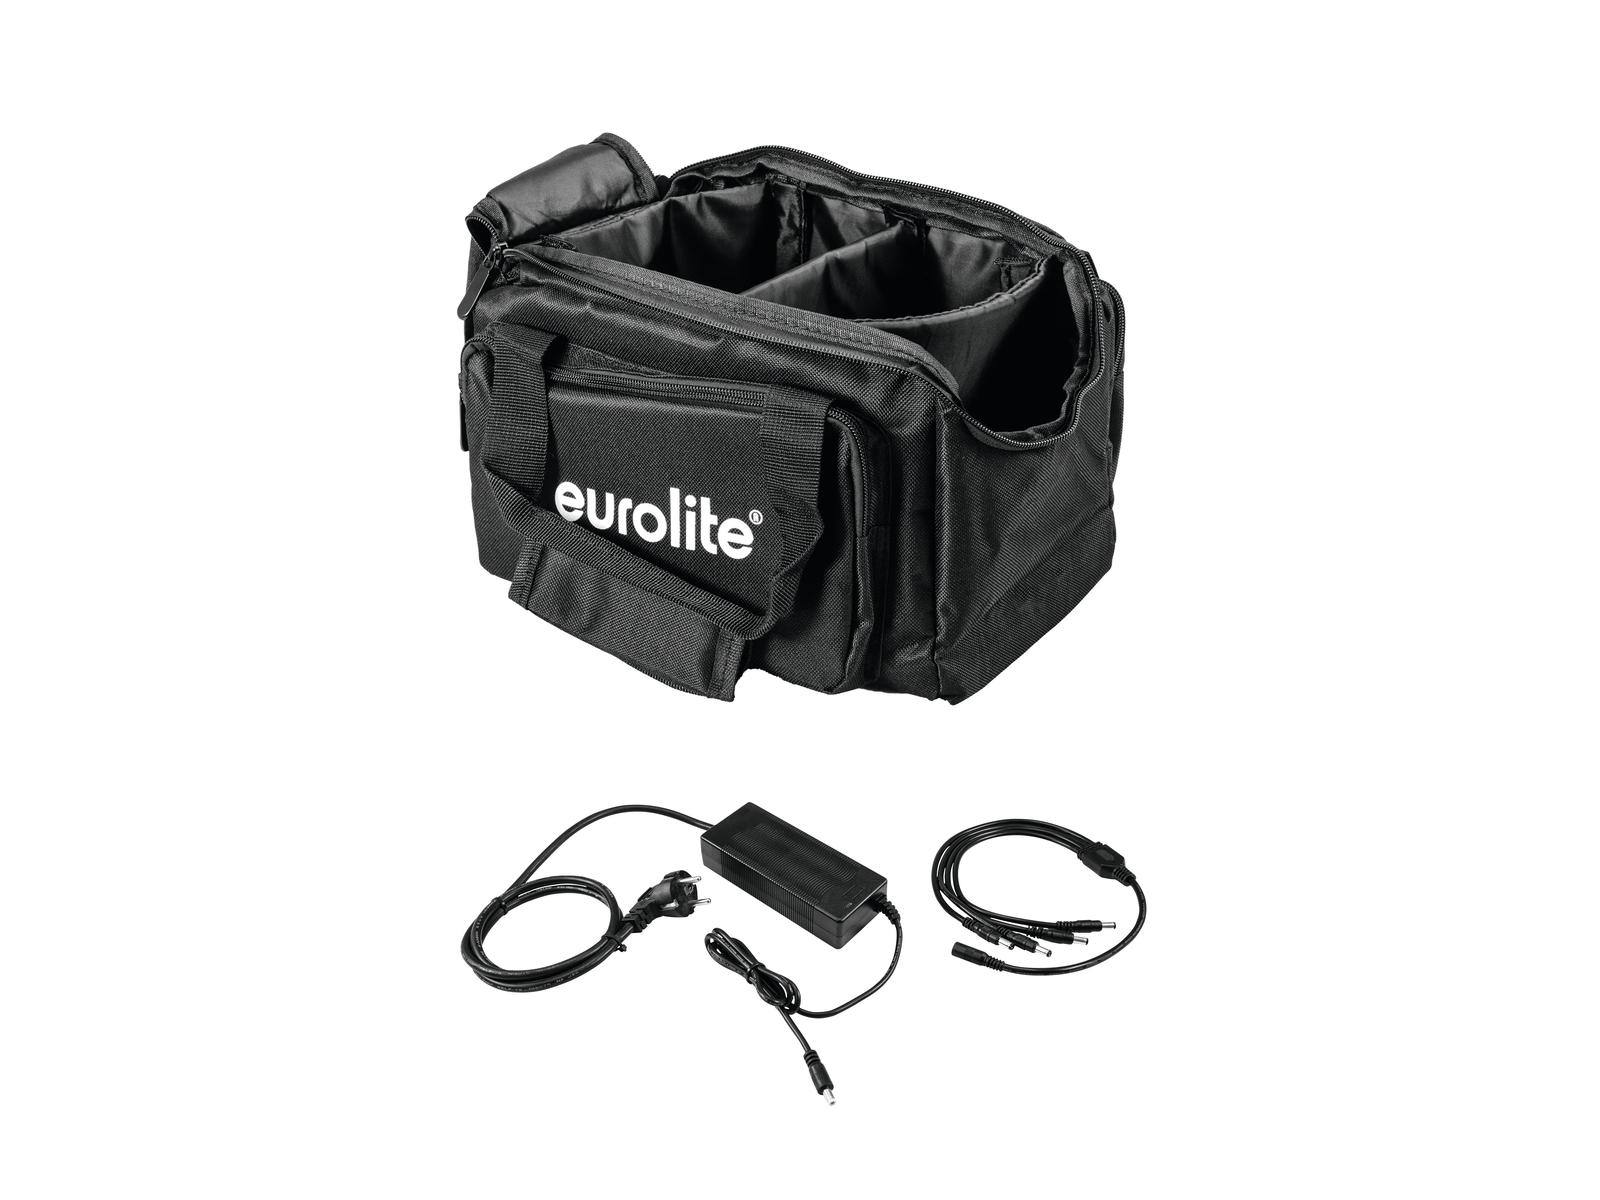 EUROLITE Set SB-14 Soft-Bag + Caricabatterie 4x AKKU Luce Piatta 1